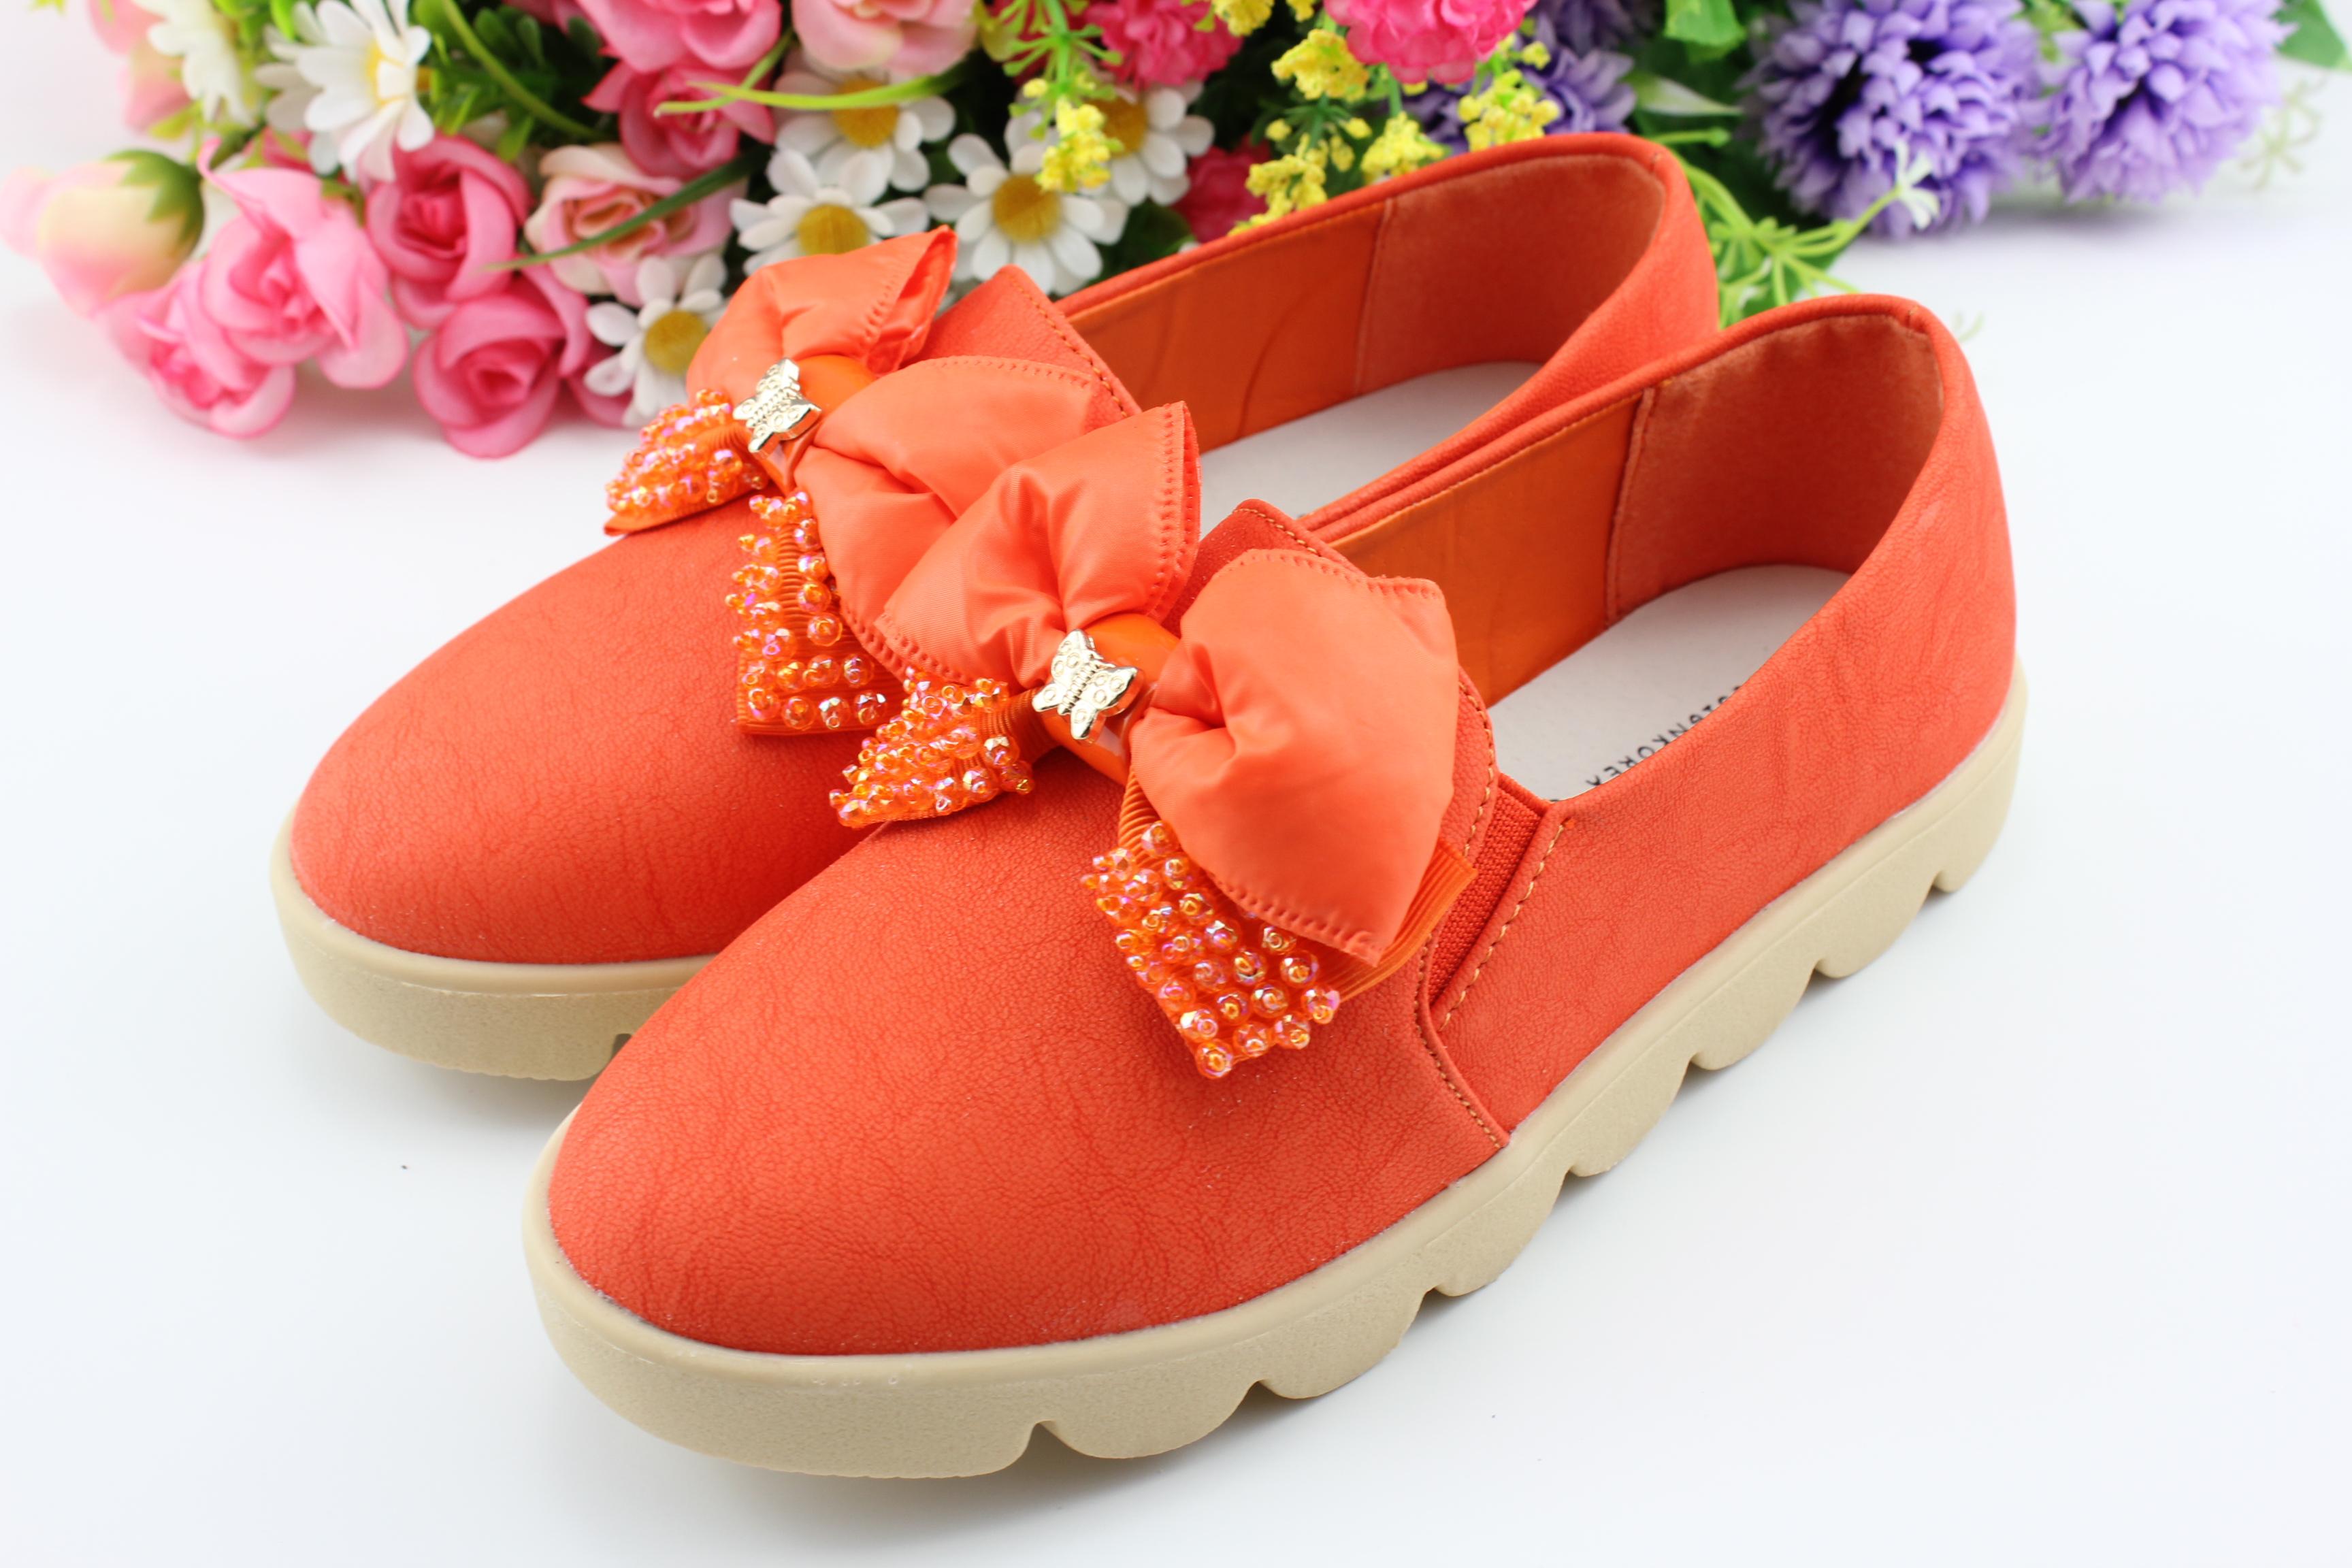 Ulasan Lengkap Peas Sepatu Kulit Korea Fashion Style Musim Semi Sepatu Anak Perempuan Sma